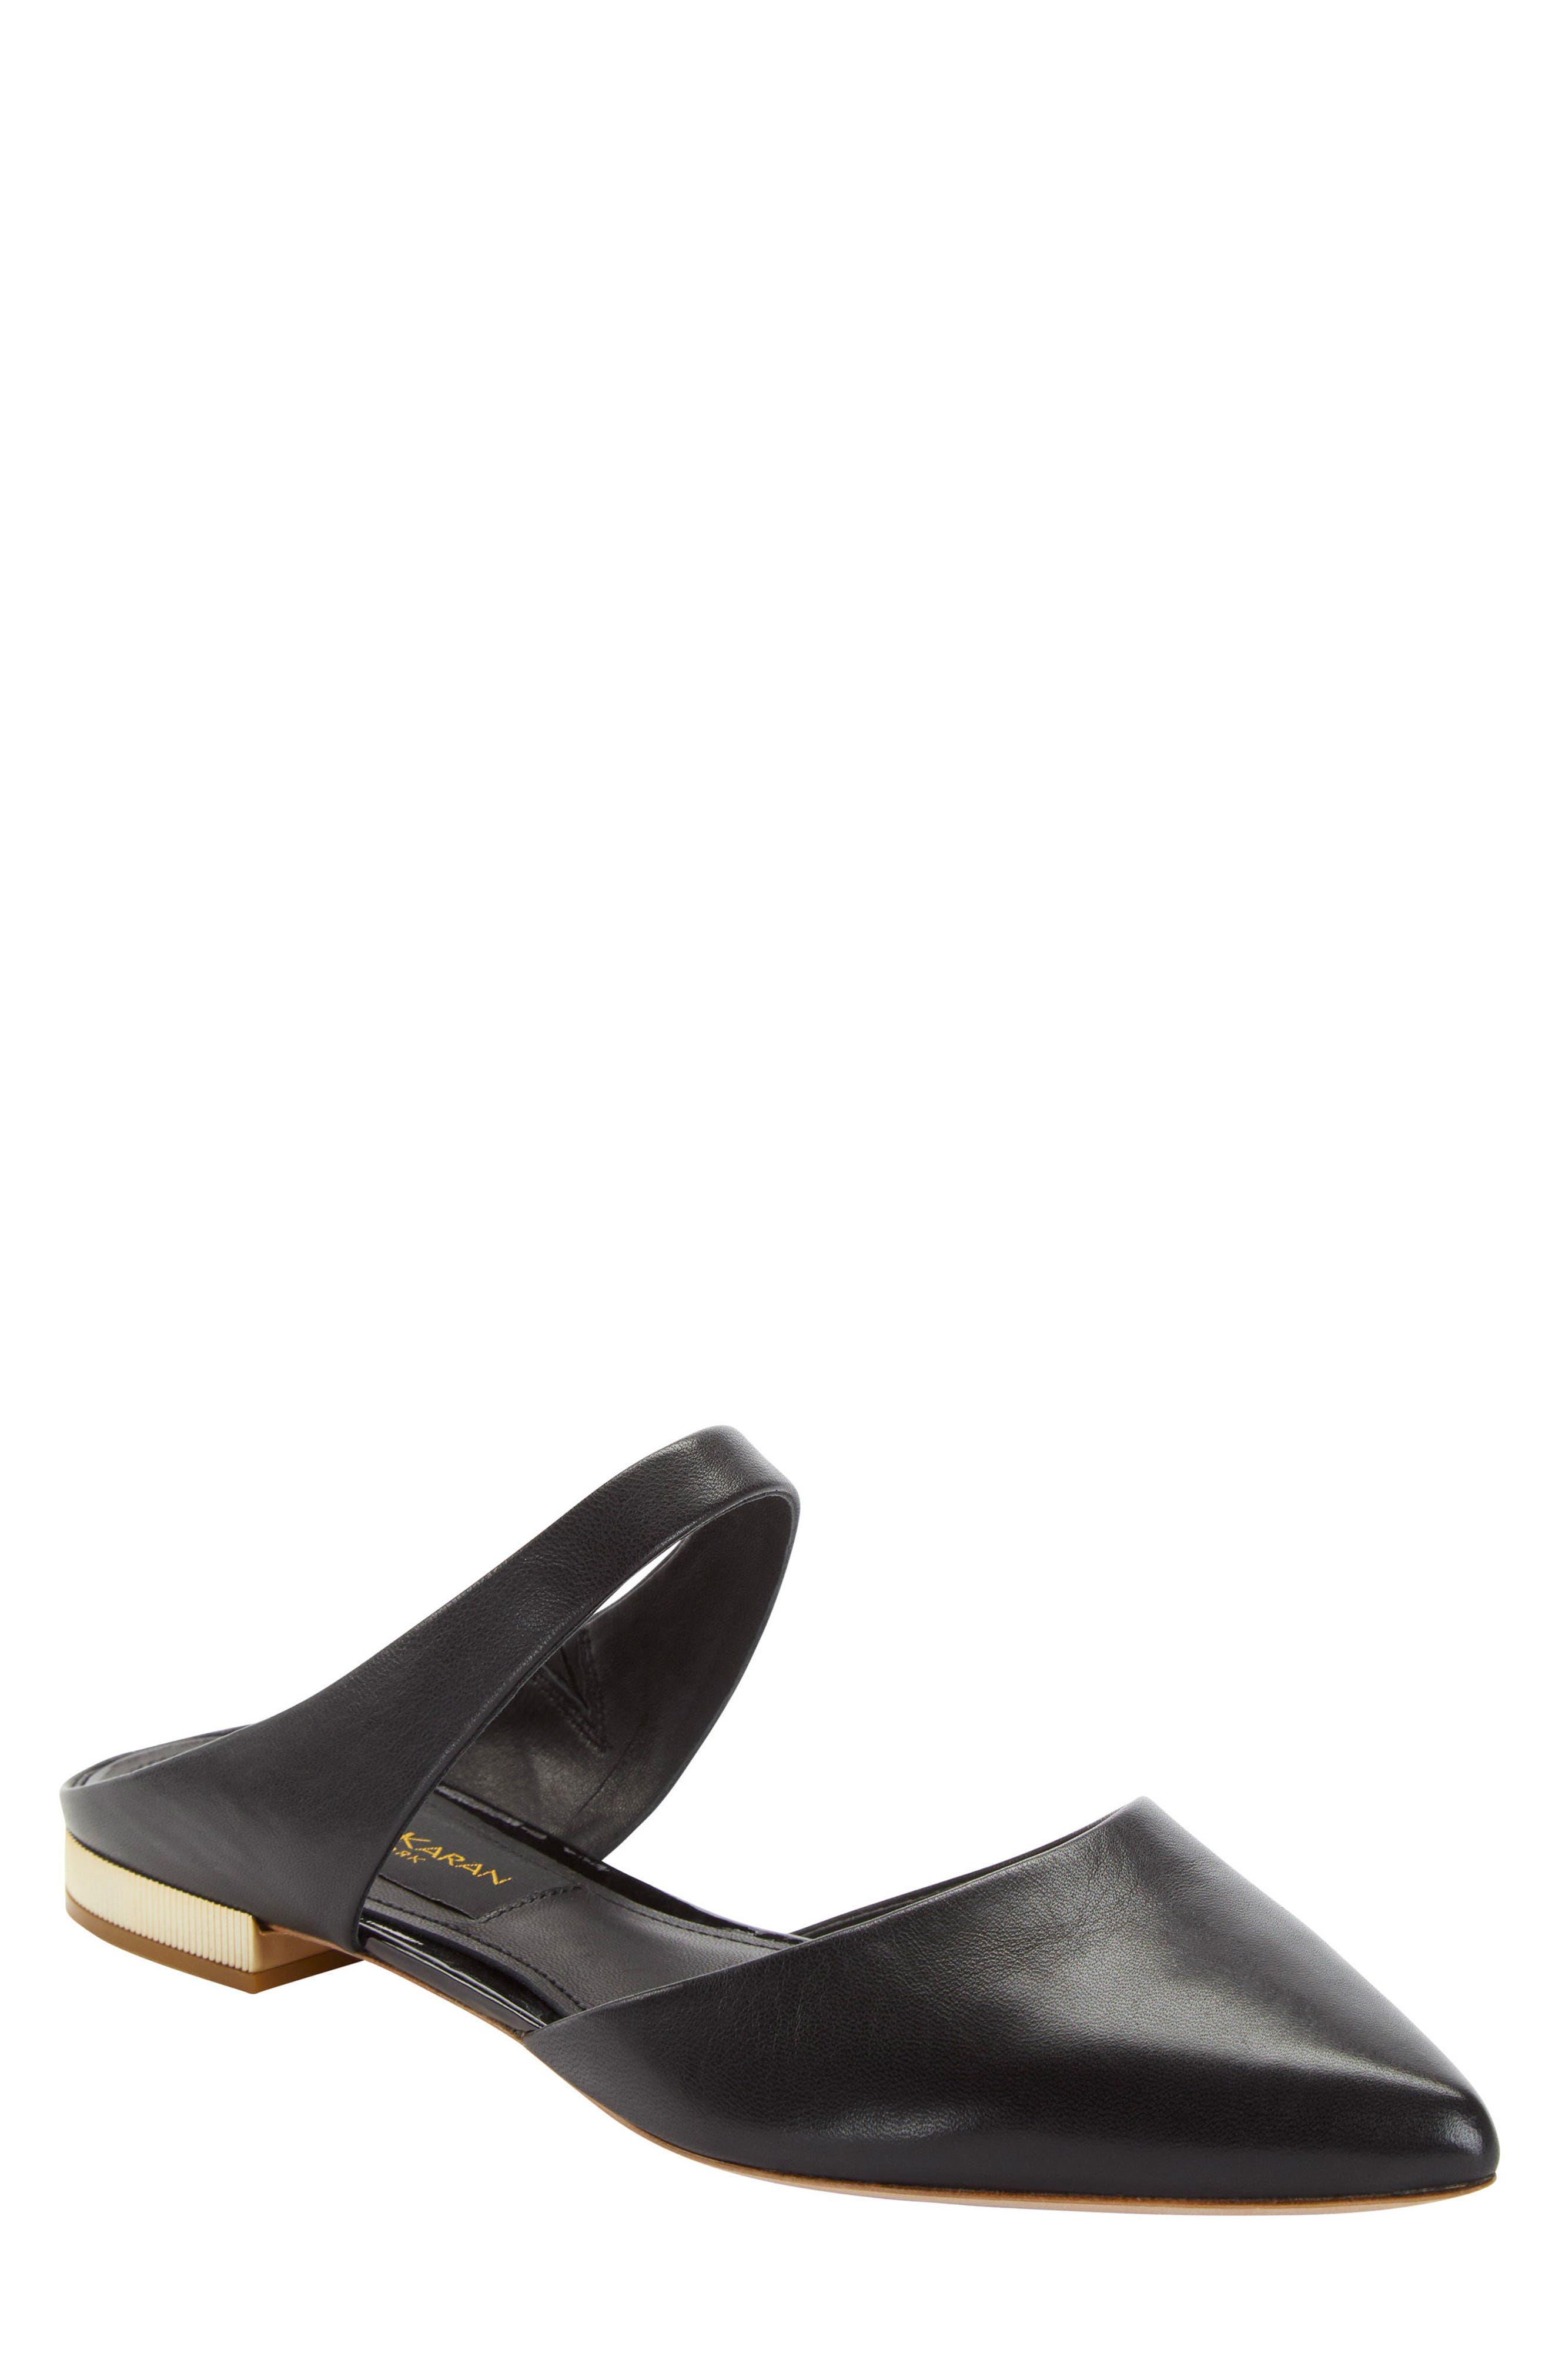 Donna Karan Paris Pointy Toe Mule,                         Main,                         color, Black Leather